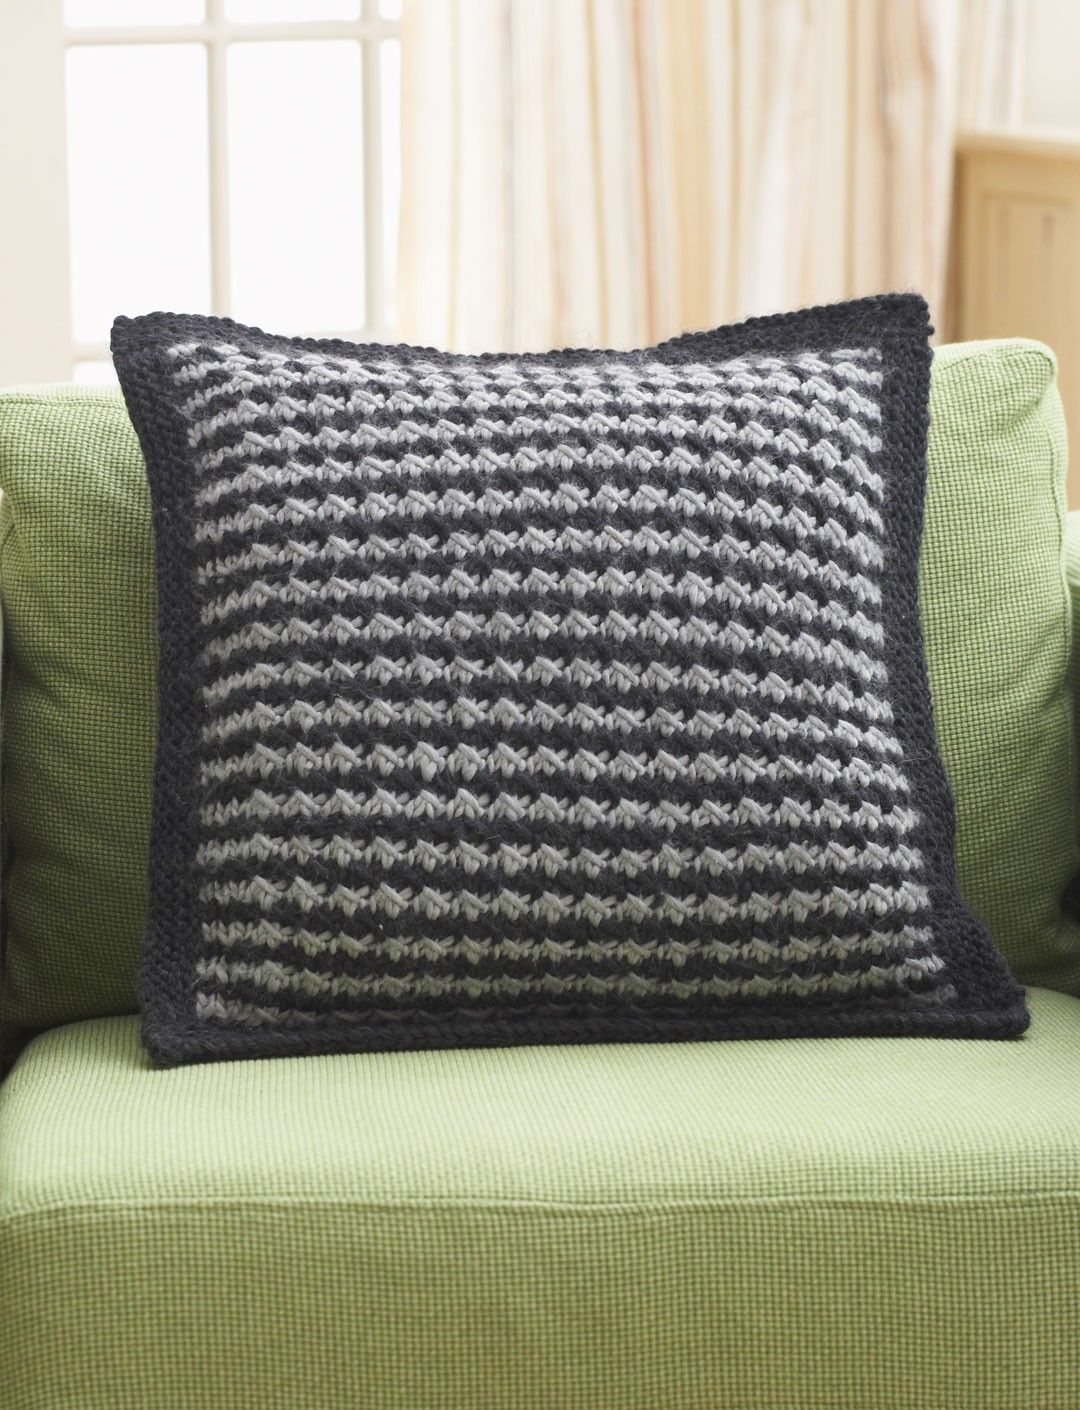 Yarnspirations bernat houndstooth pillow patterns houndstooth pillow free knitting pattern and more pillow and cushion knitting patterns bankloansurffo Choice Image